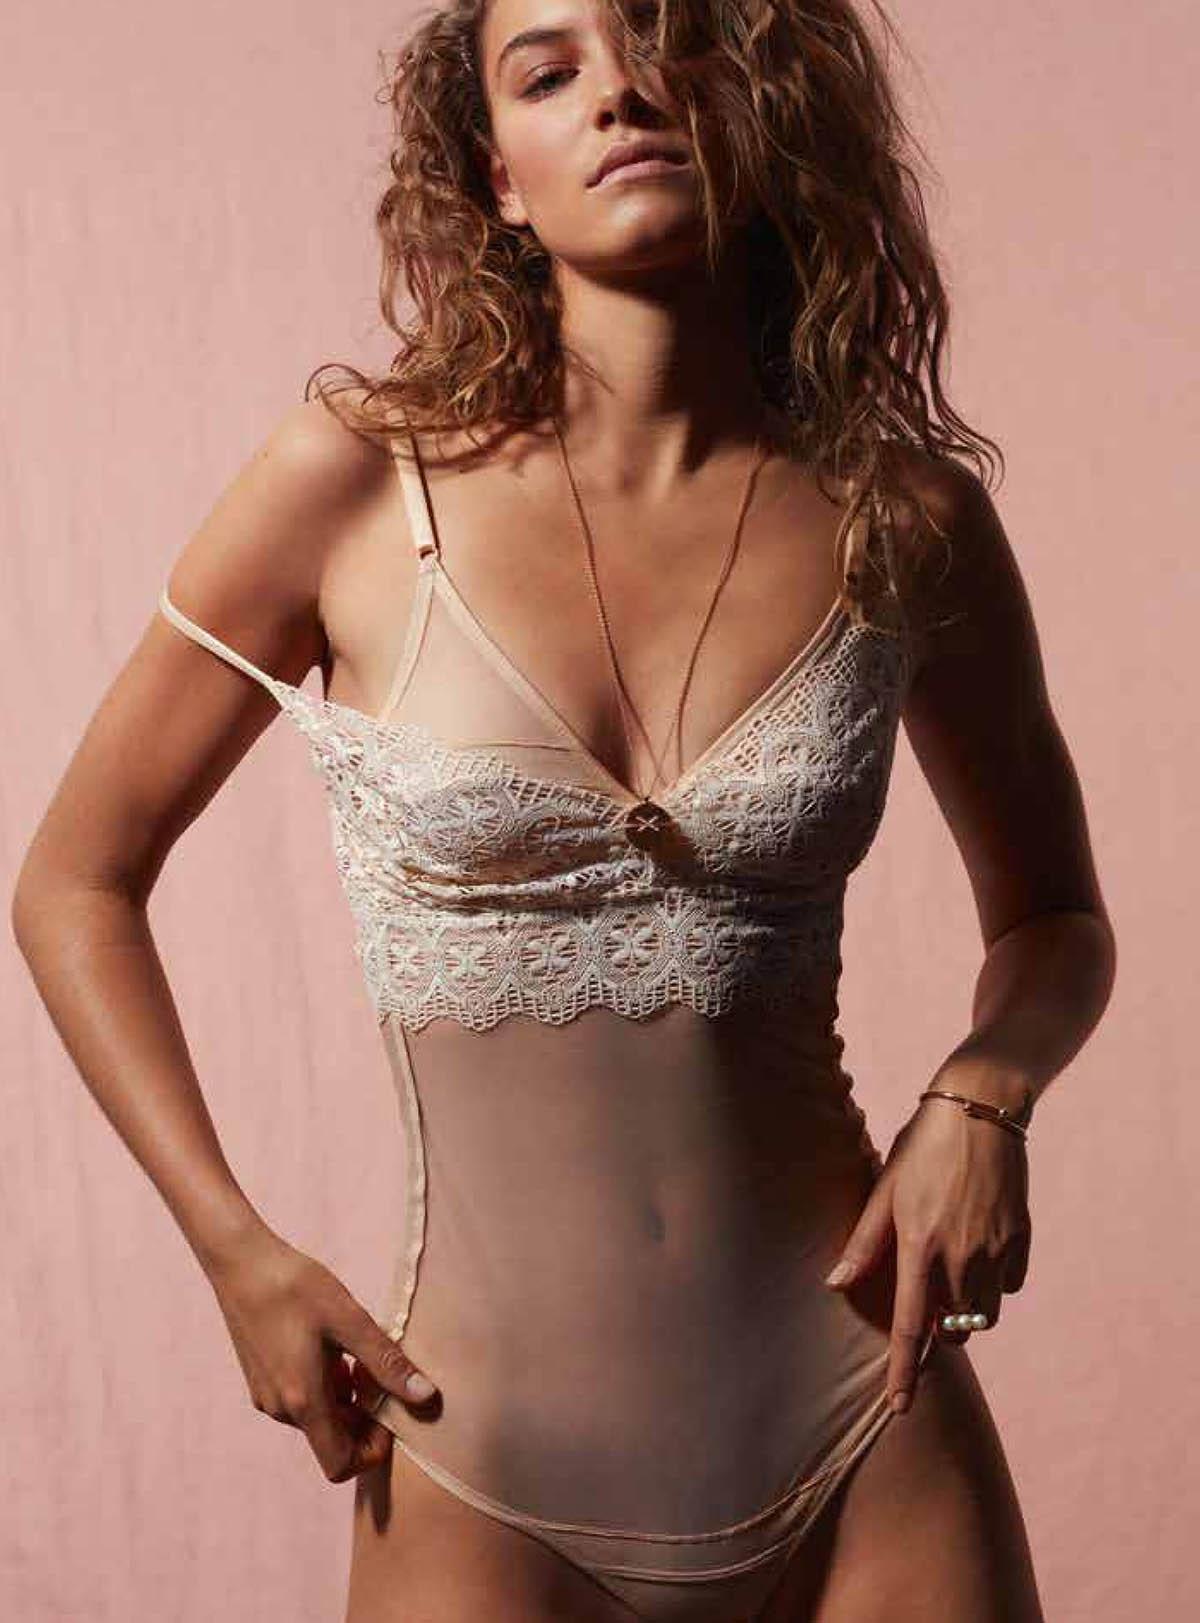 Johanna Schapfeld by Karina Twiss for Madame Figaro February 5th, 2021